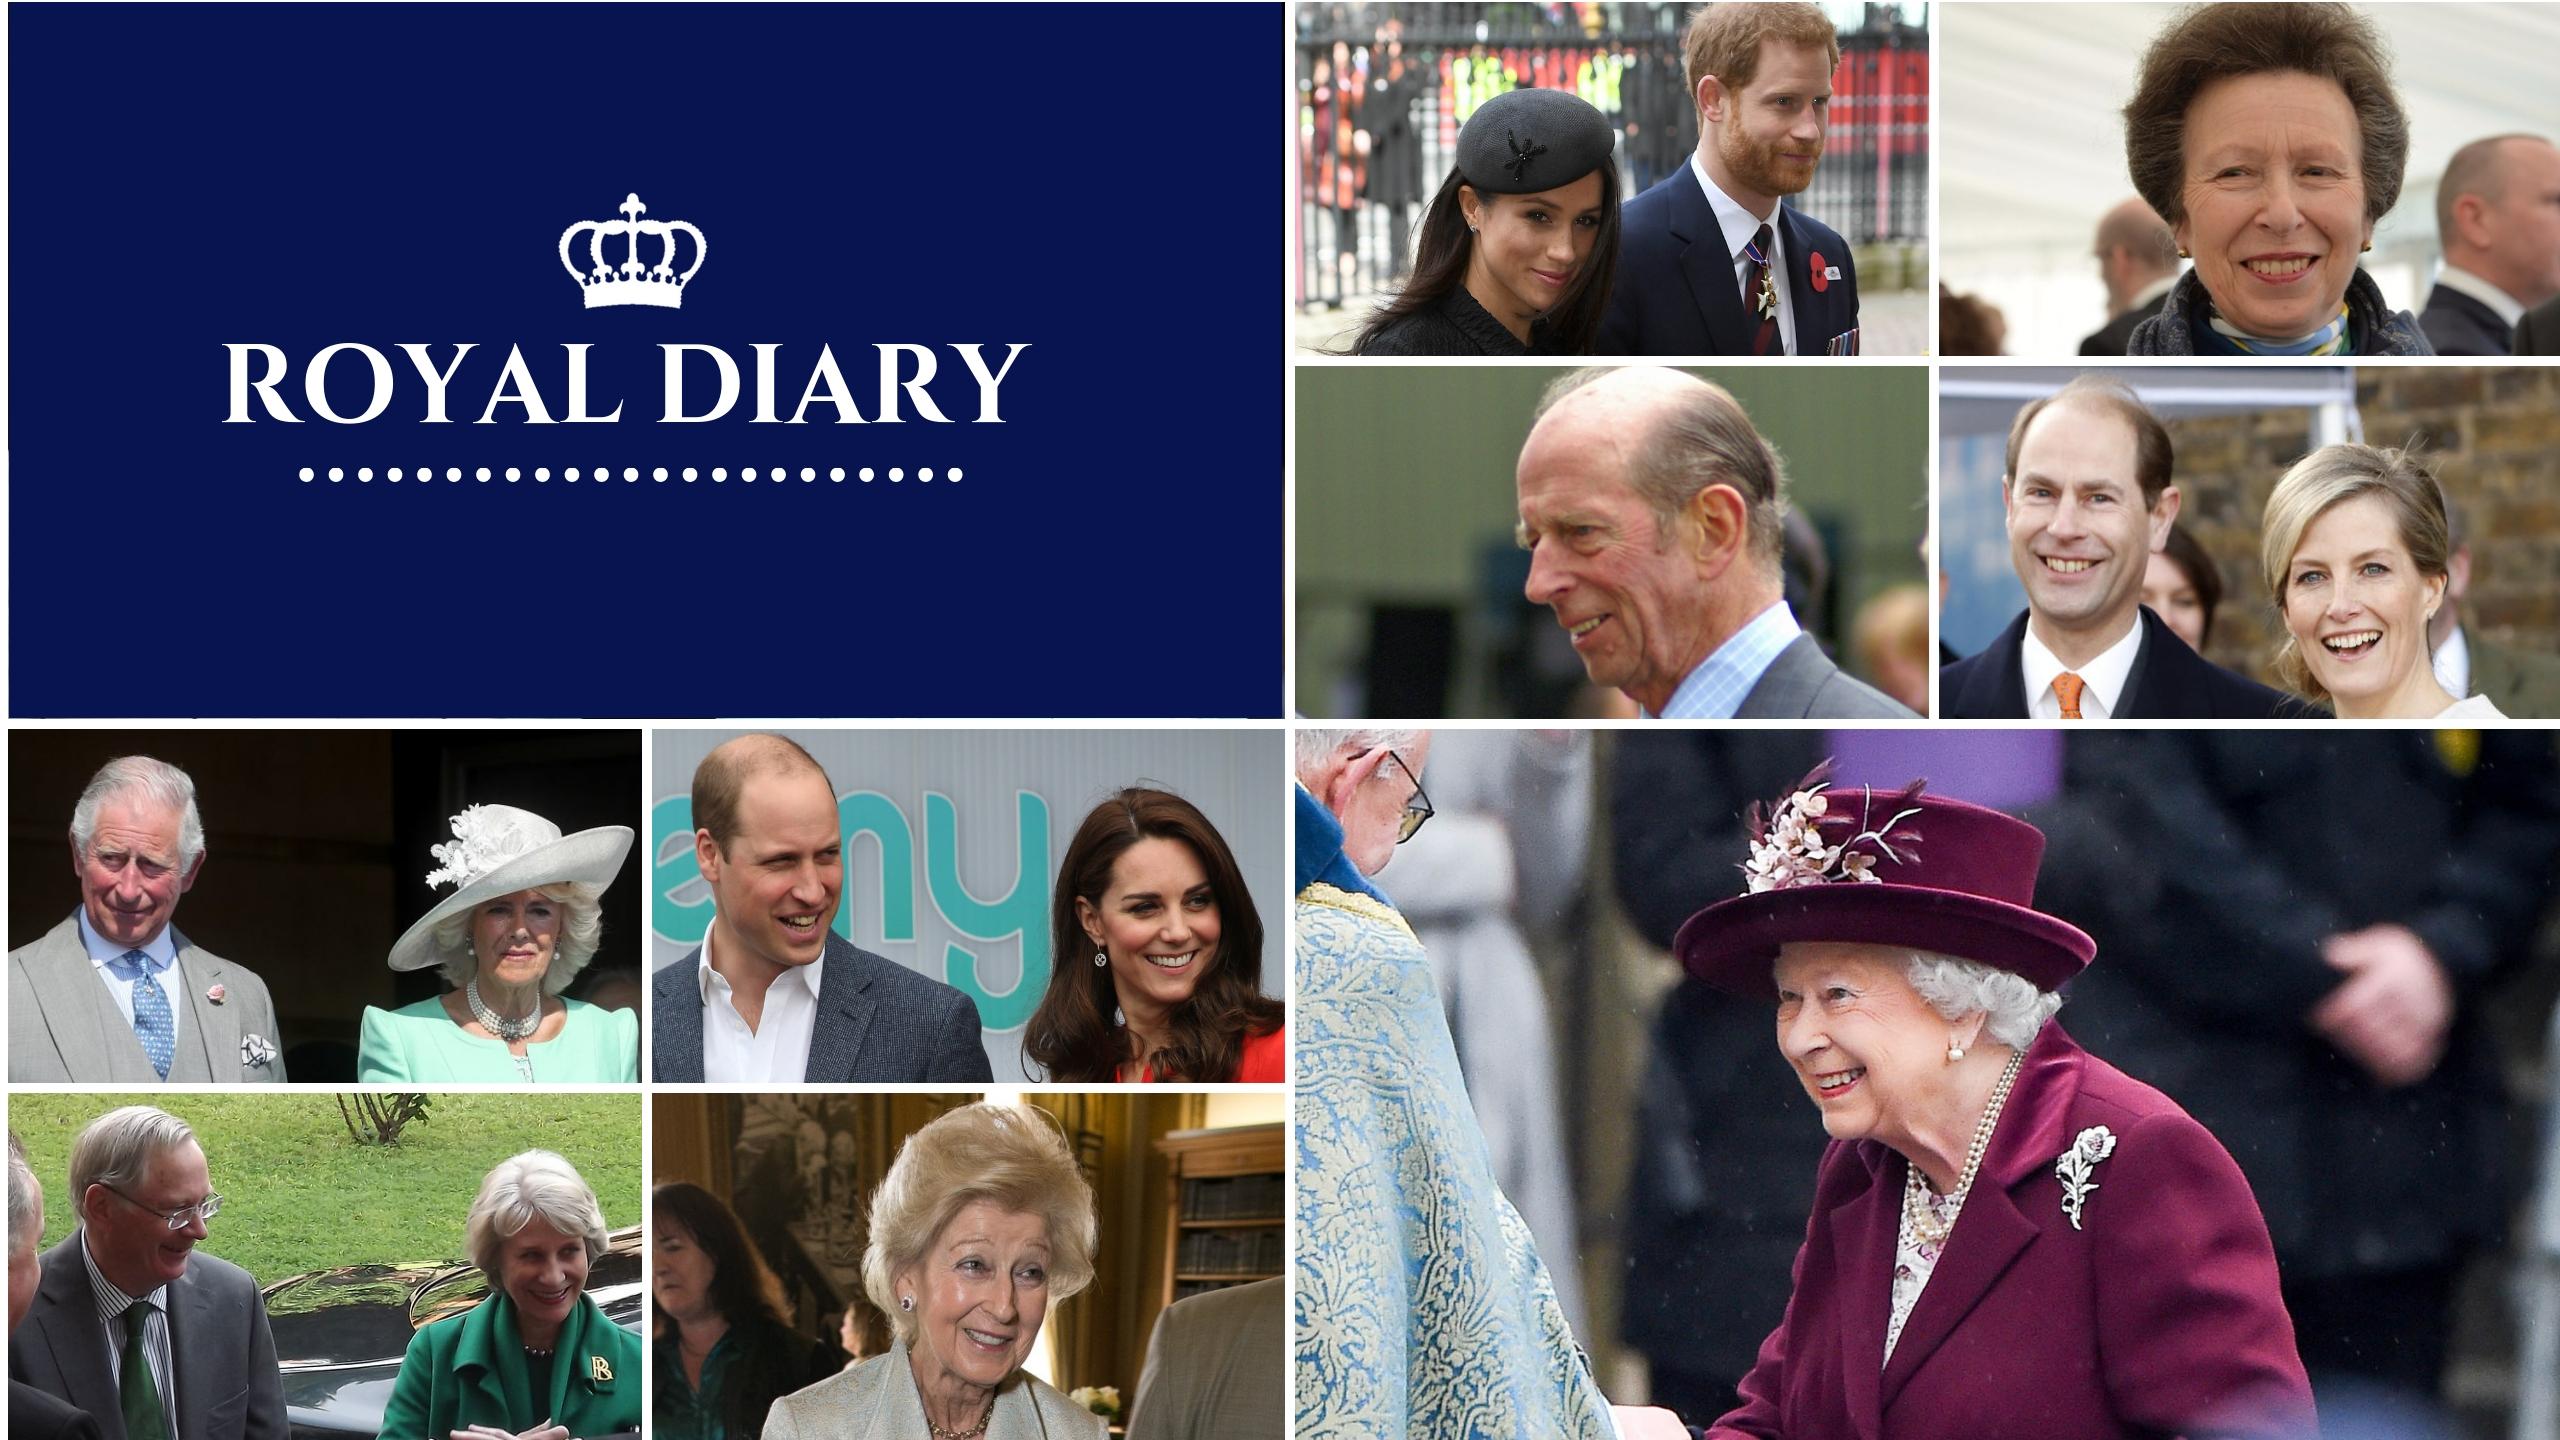 Royal diary: upcoming royal engagements 22-28th July • The Crown Chronicles